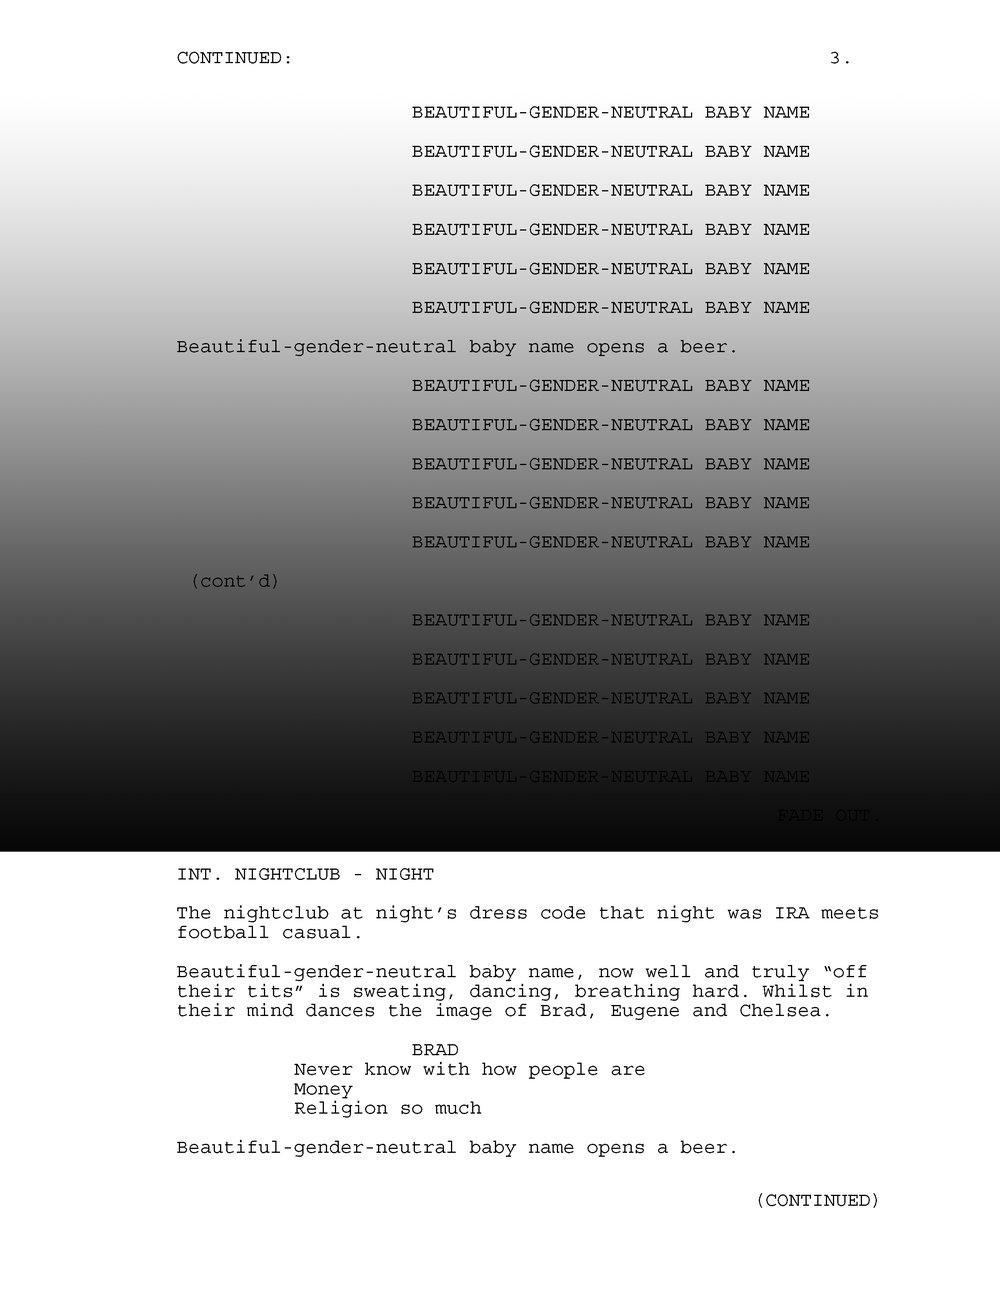 Untitled 2016 SCRIPT FOR WEB_6.jpg